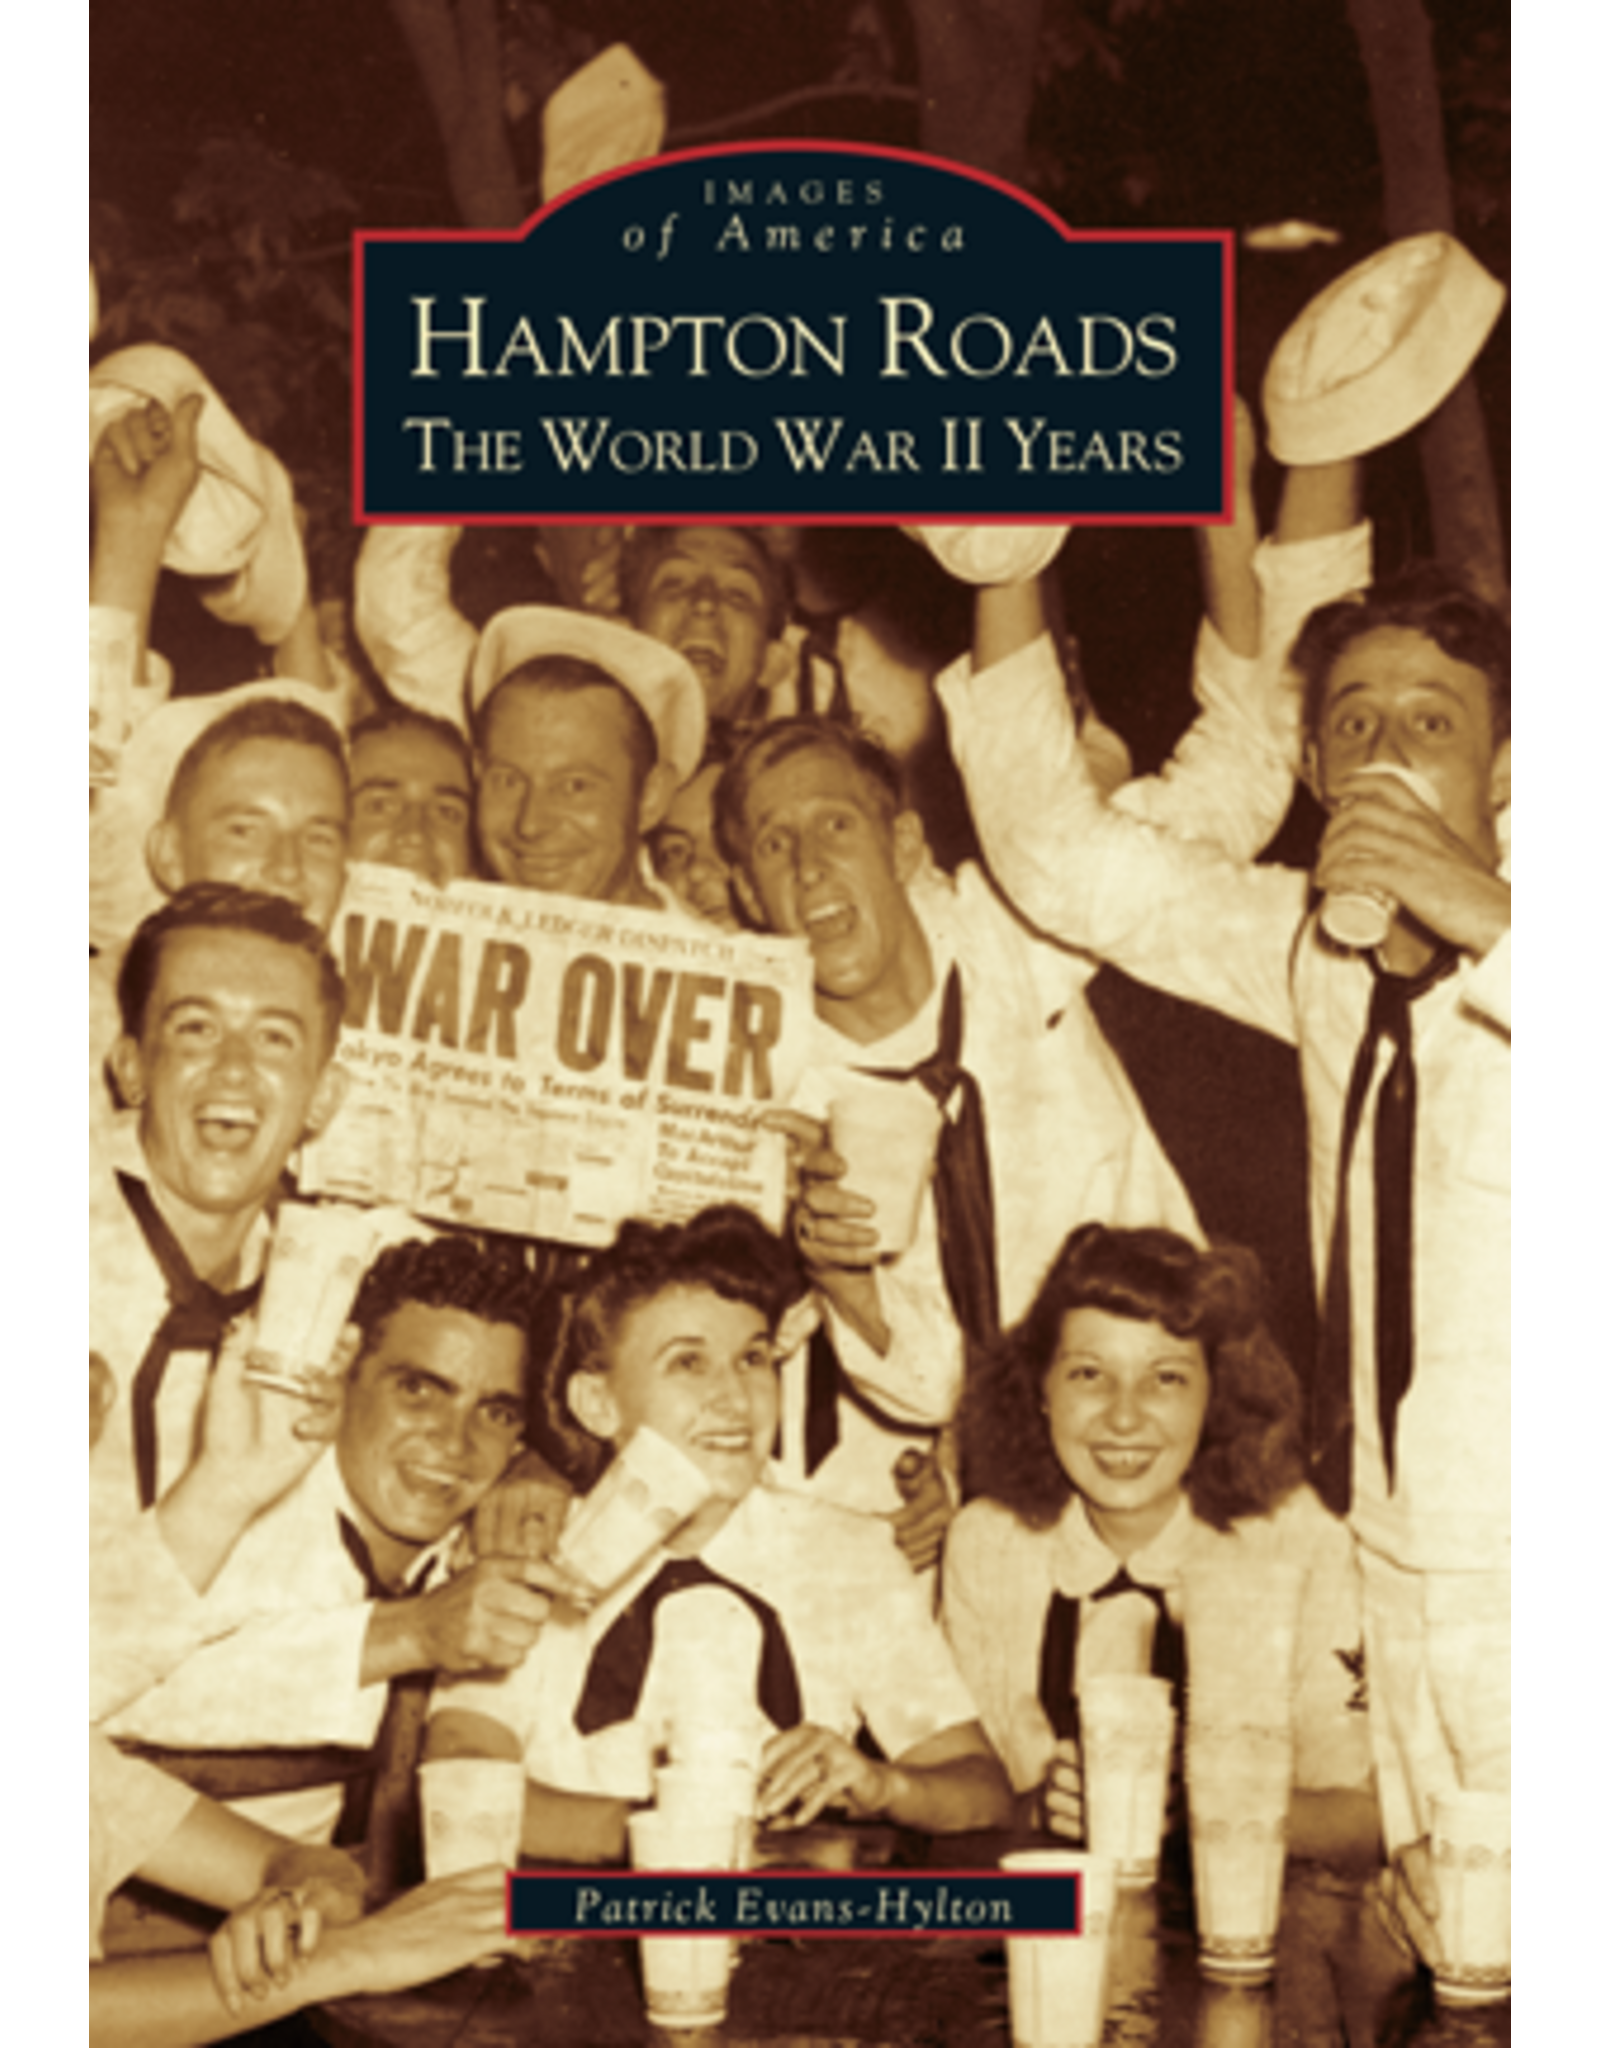 Images of America - Hampton Roads  The World War II Years